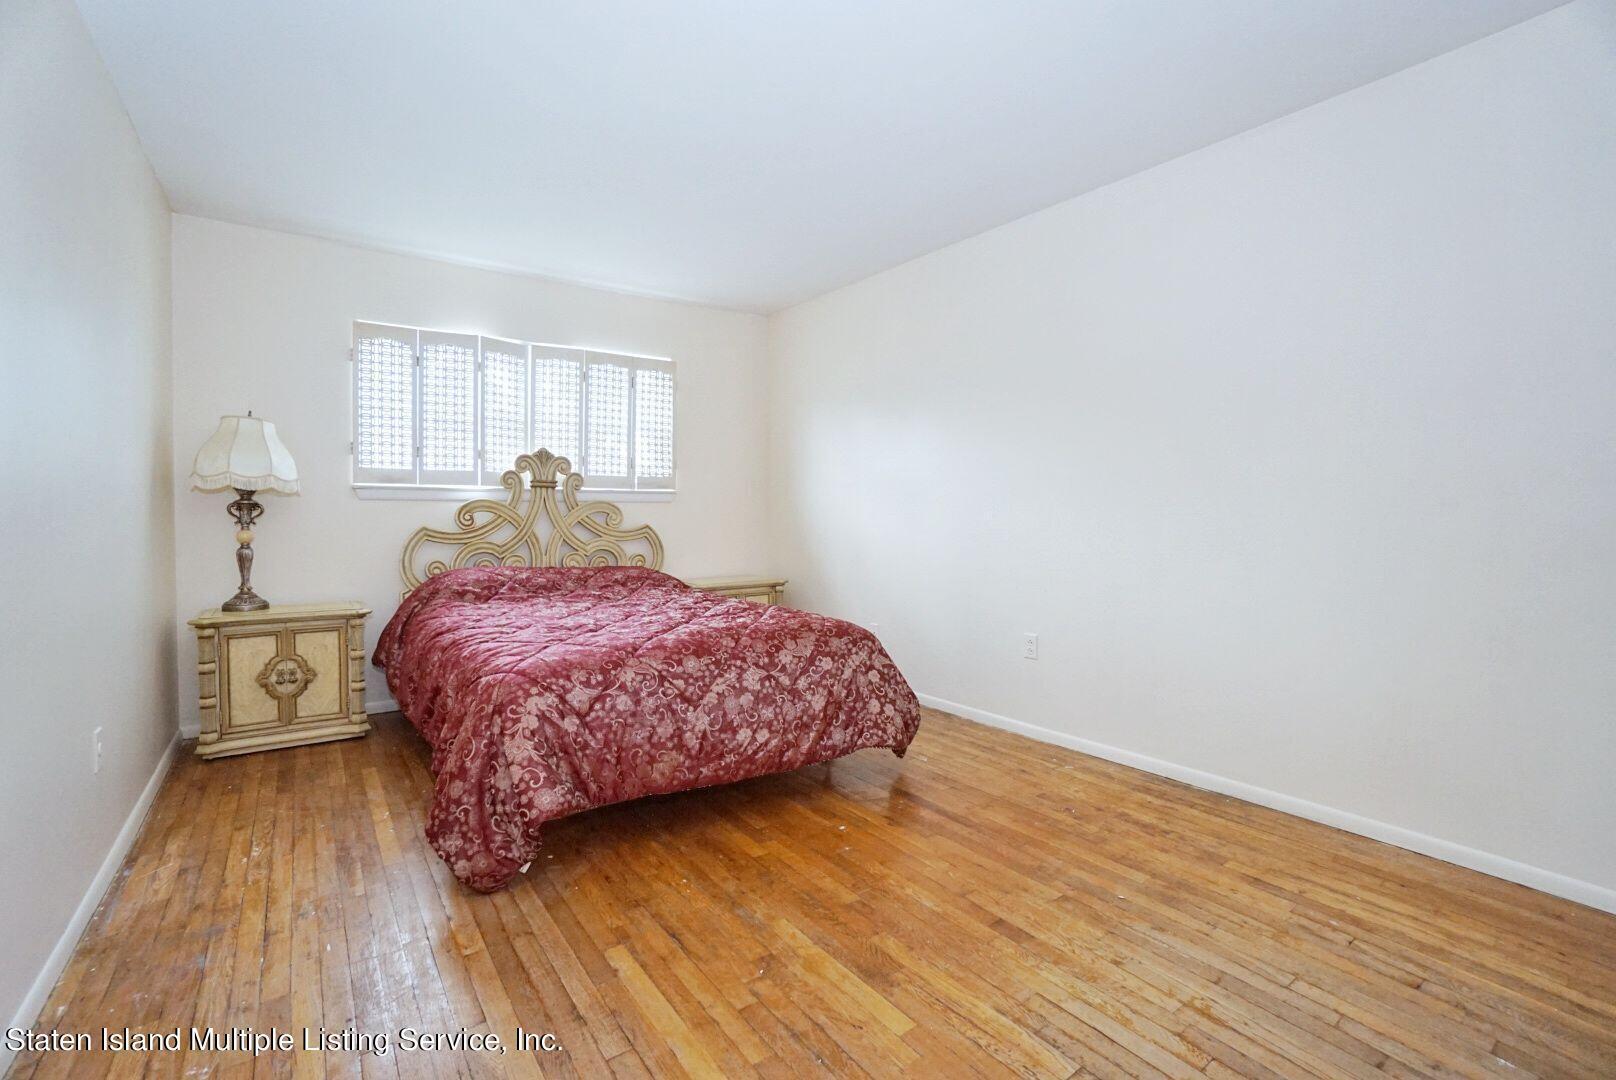 Single Family - Detached 94 Cranford Avenue  Staten Island, NY 10306, MLS-1146620-27